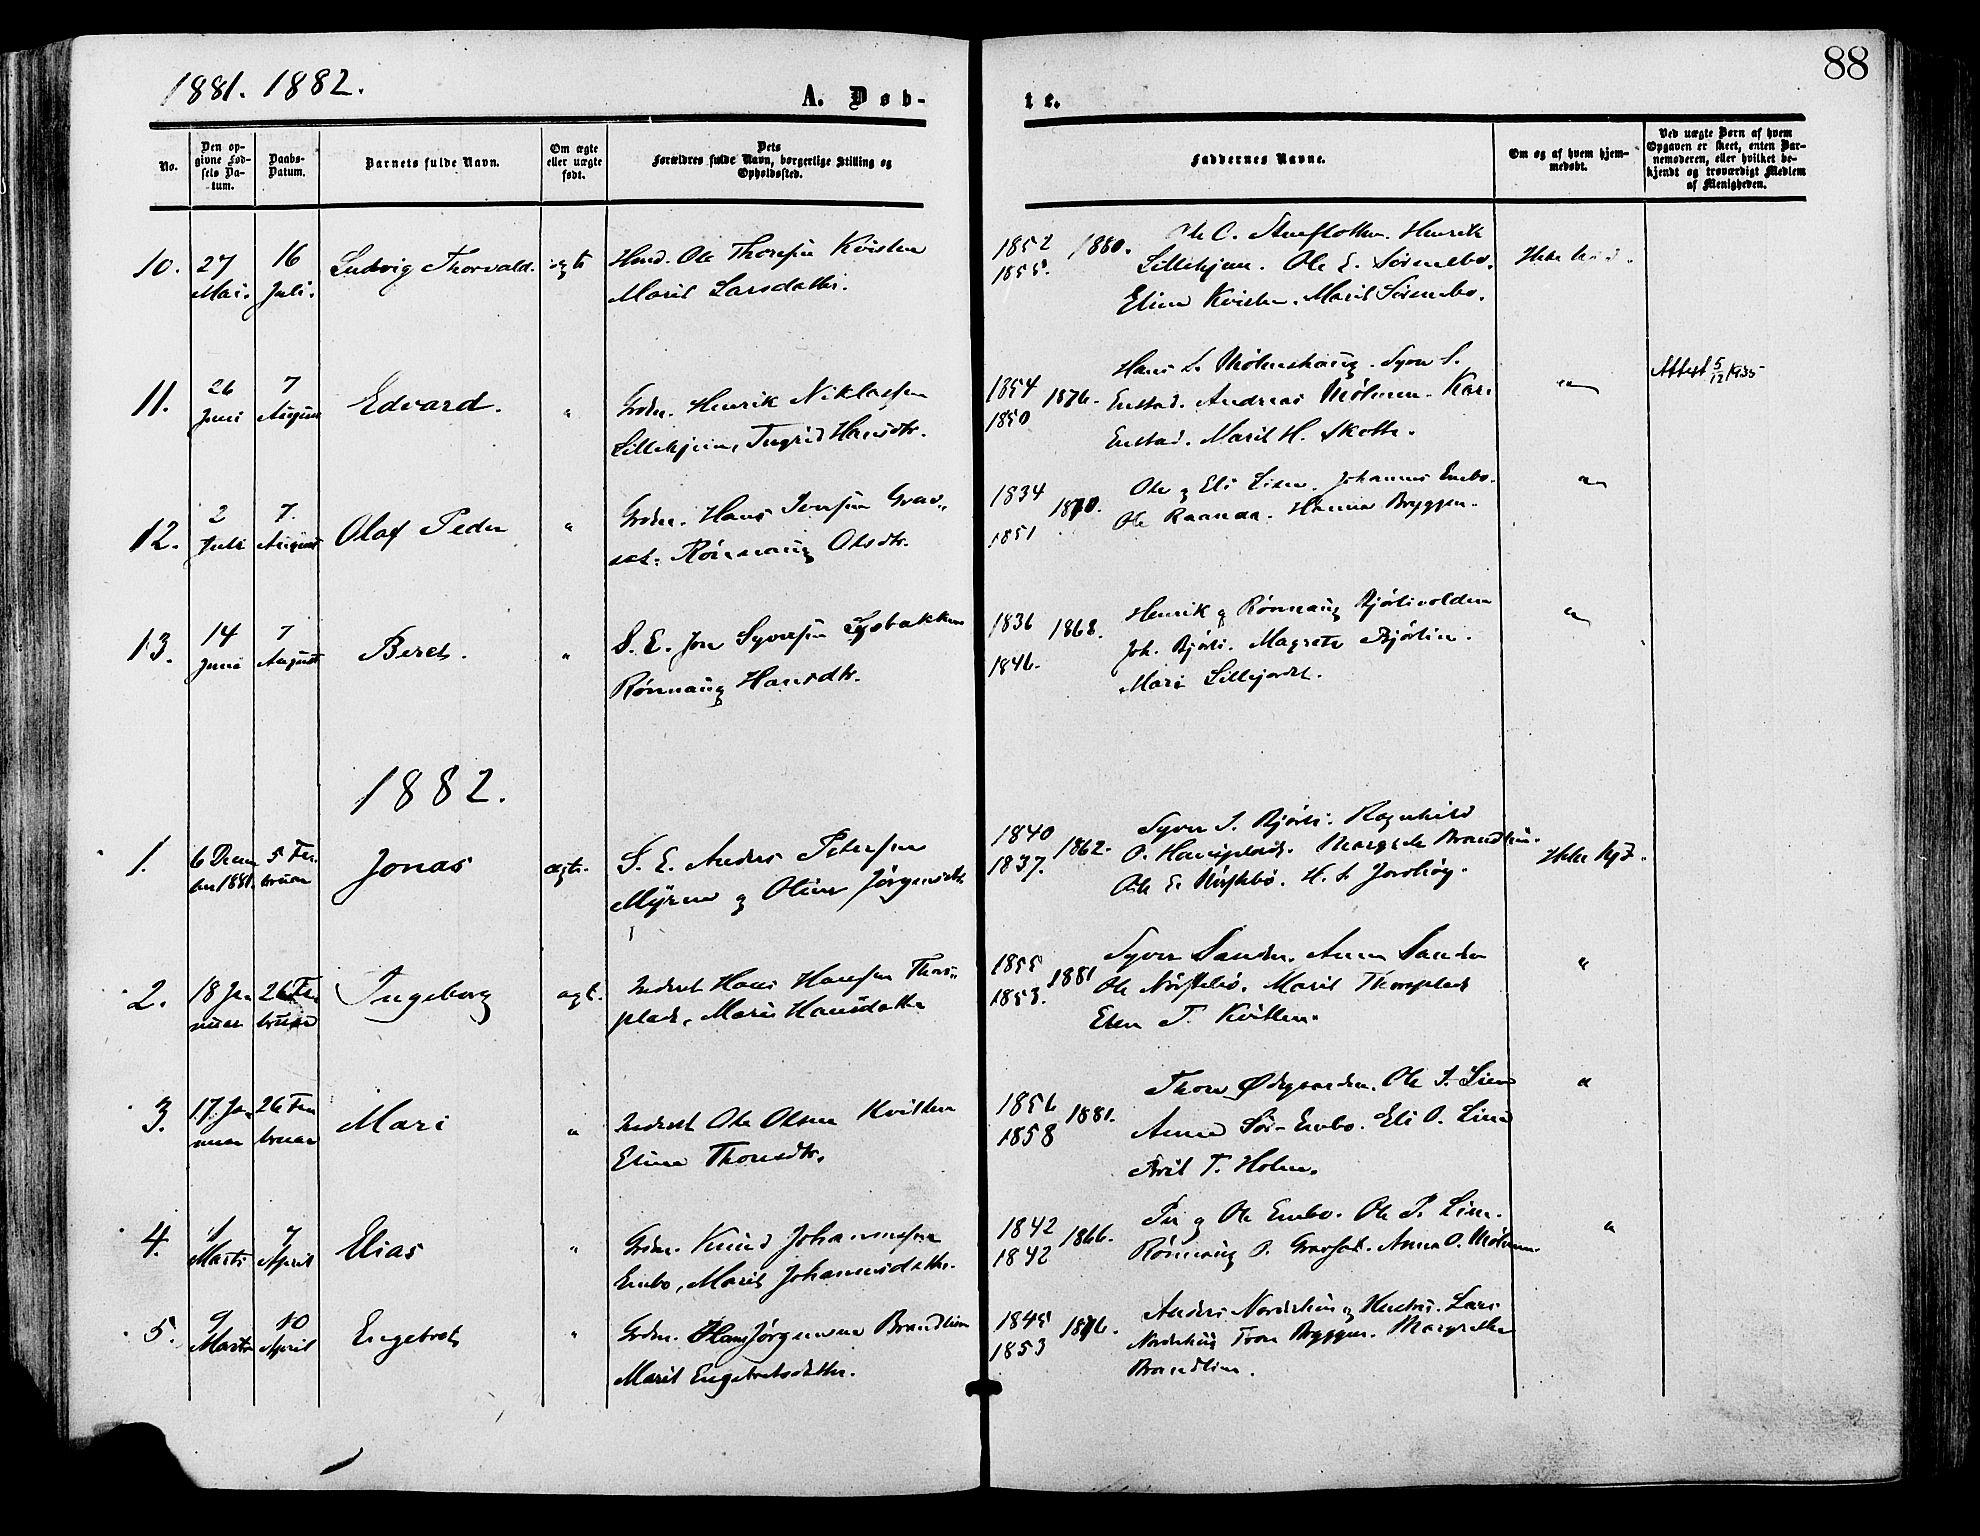 SAH, Lesja prestekontor, Ministerialbok nr. 9, 1854-1889, s. 88